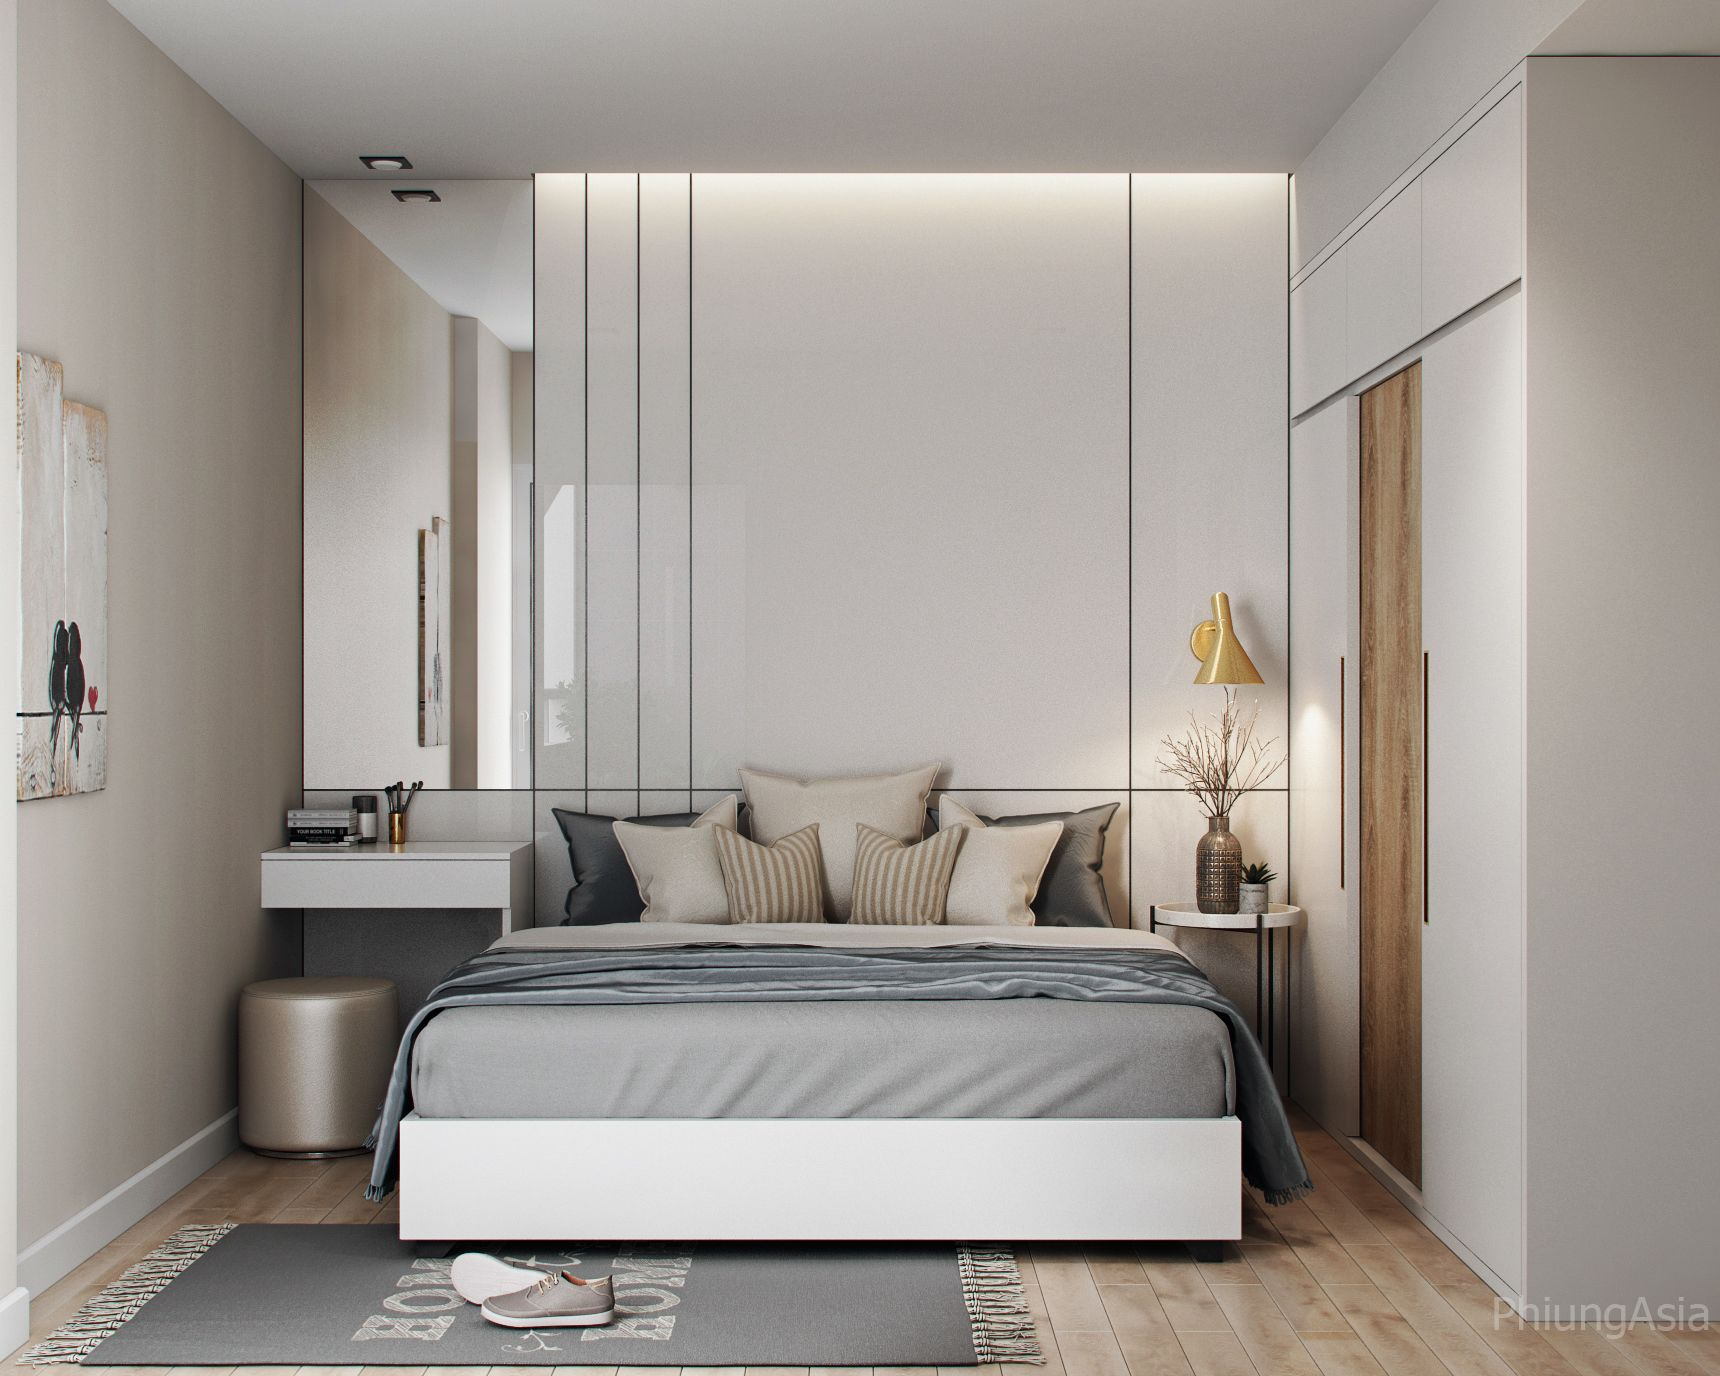 https://www.behance.net/gallery/42648613/60m2-apartment-1-bedroom ...